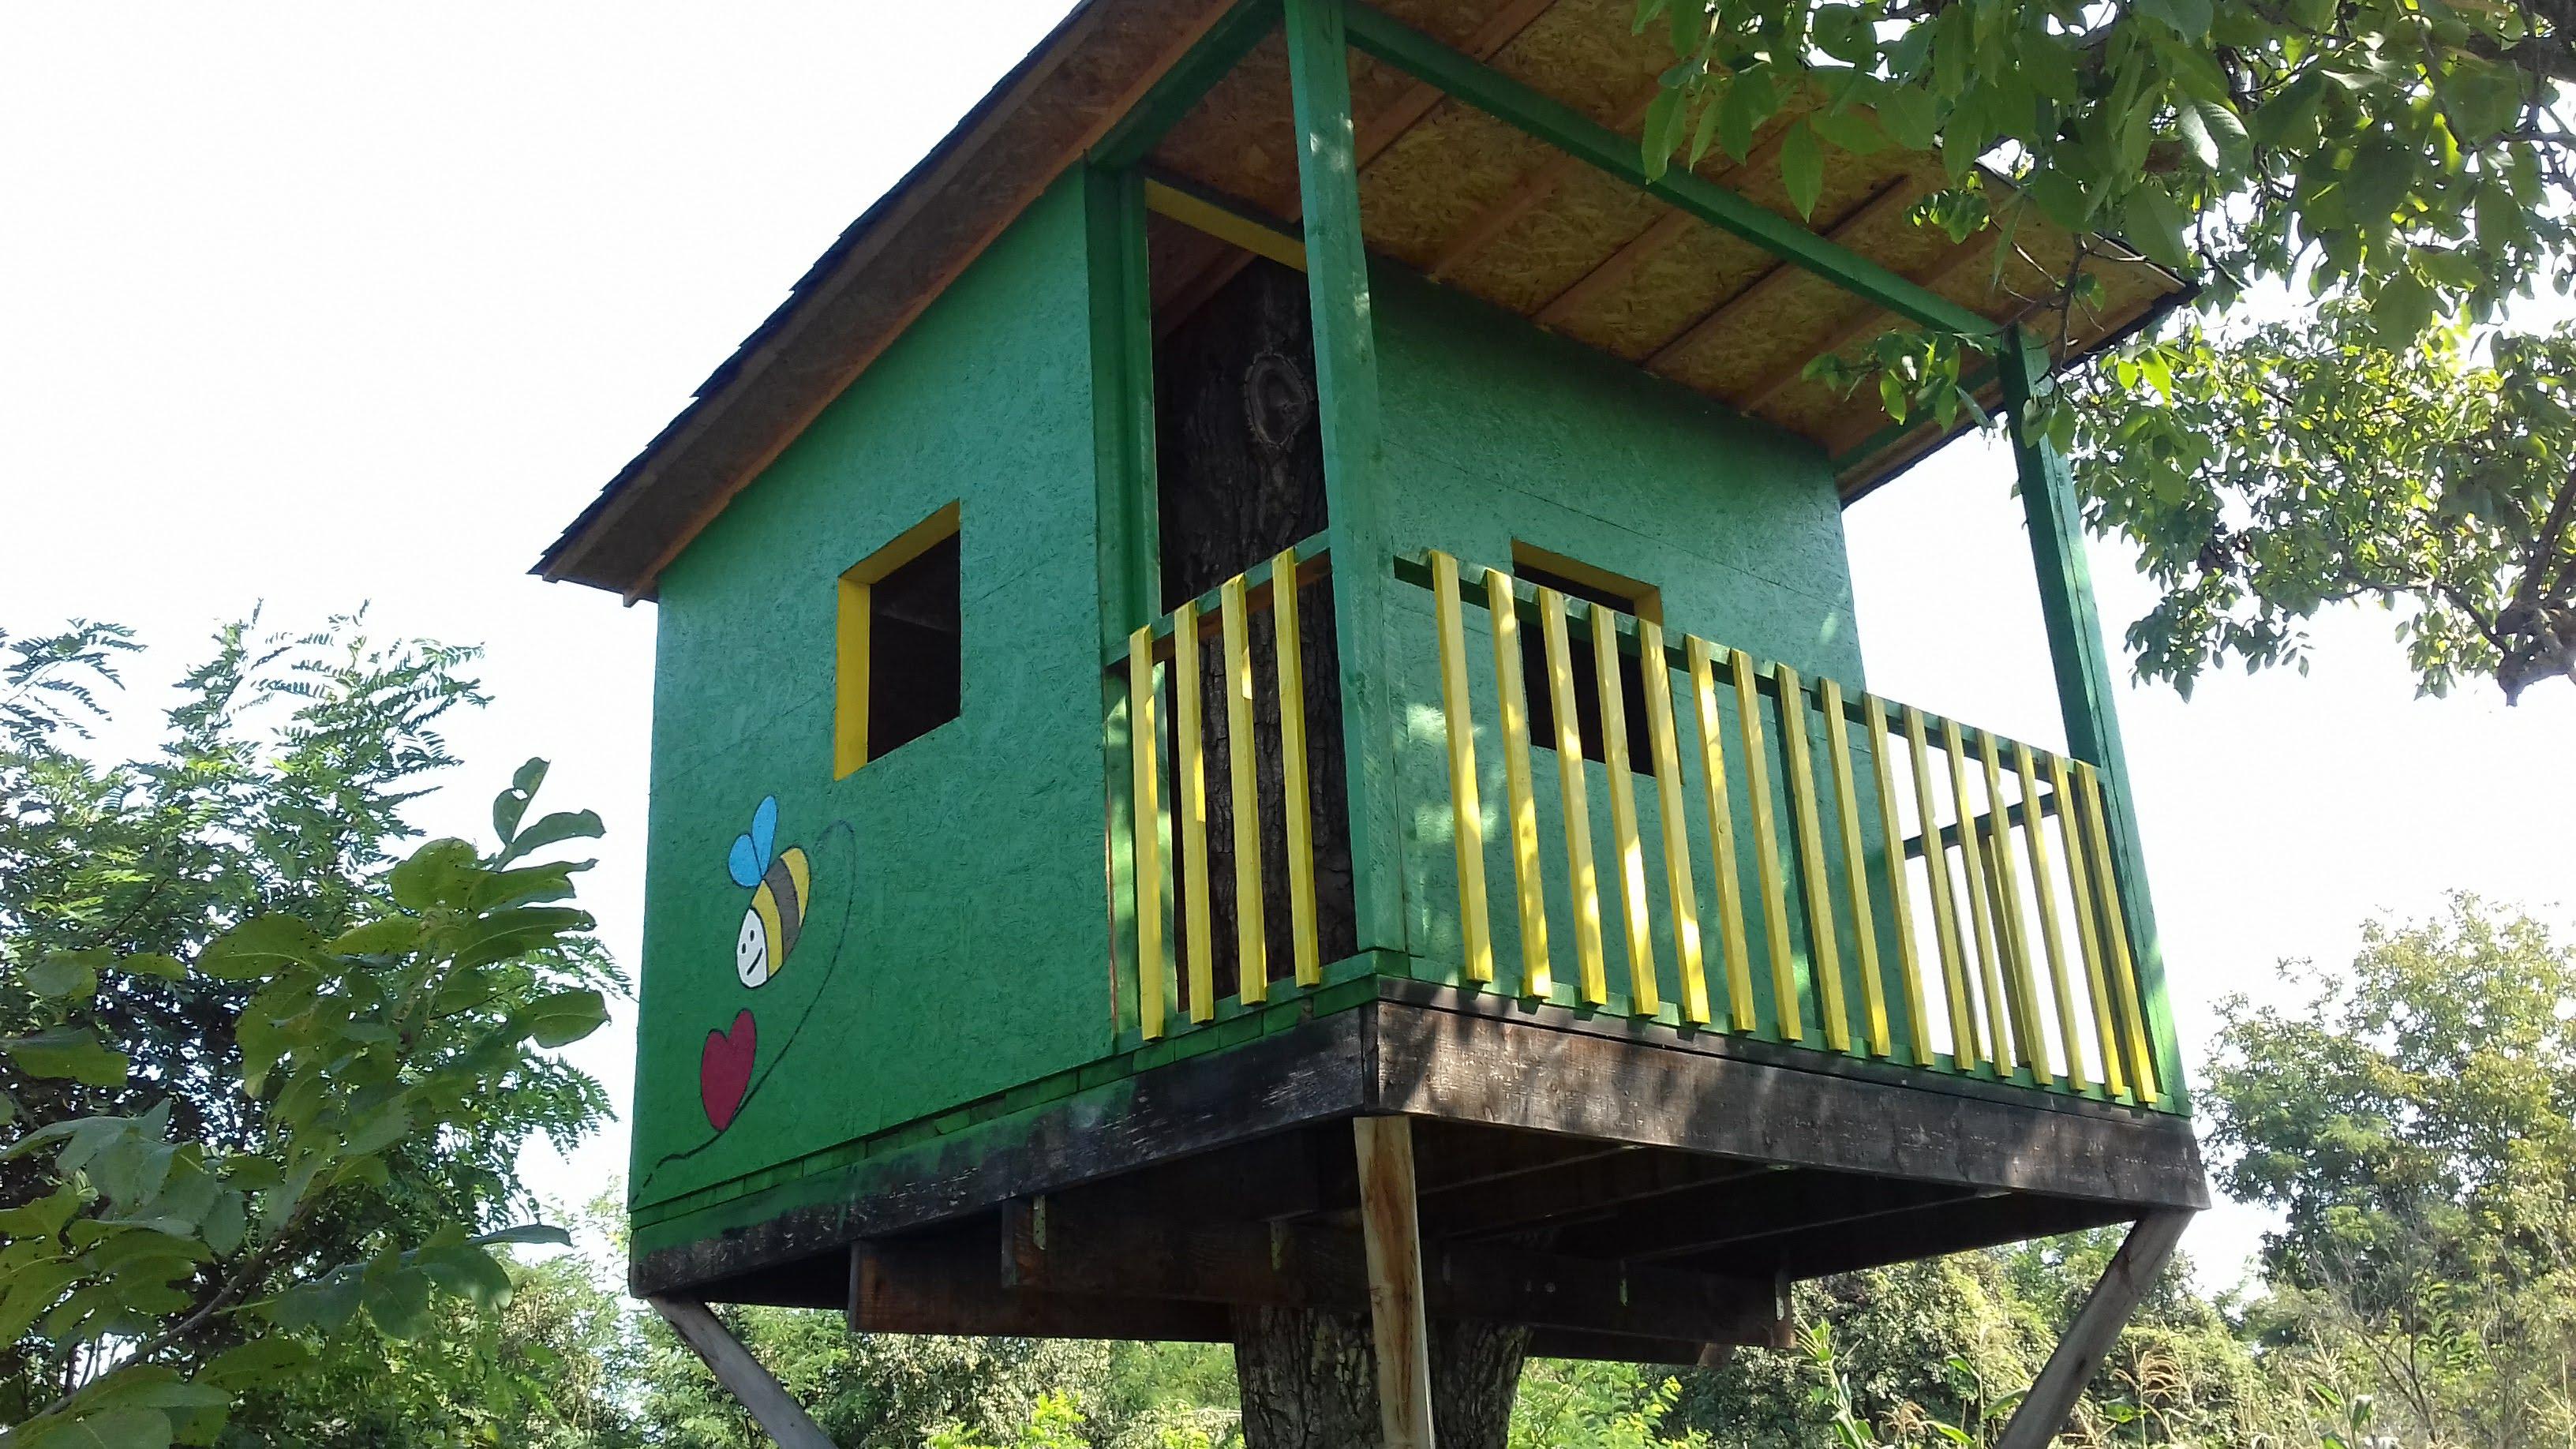 Casa din copac sau Apicultura la inaltime